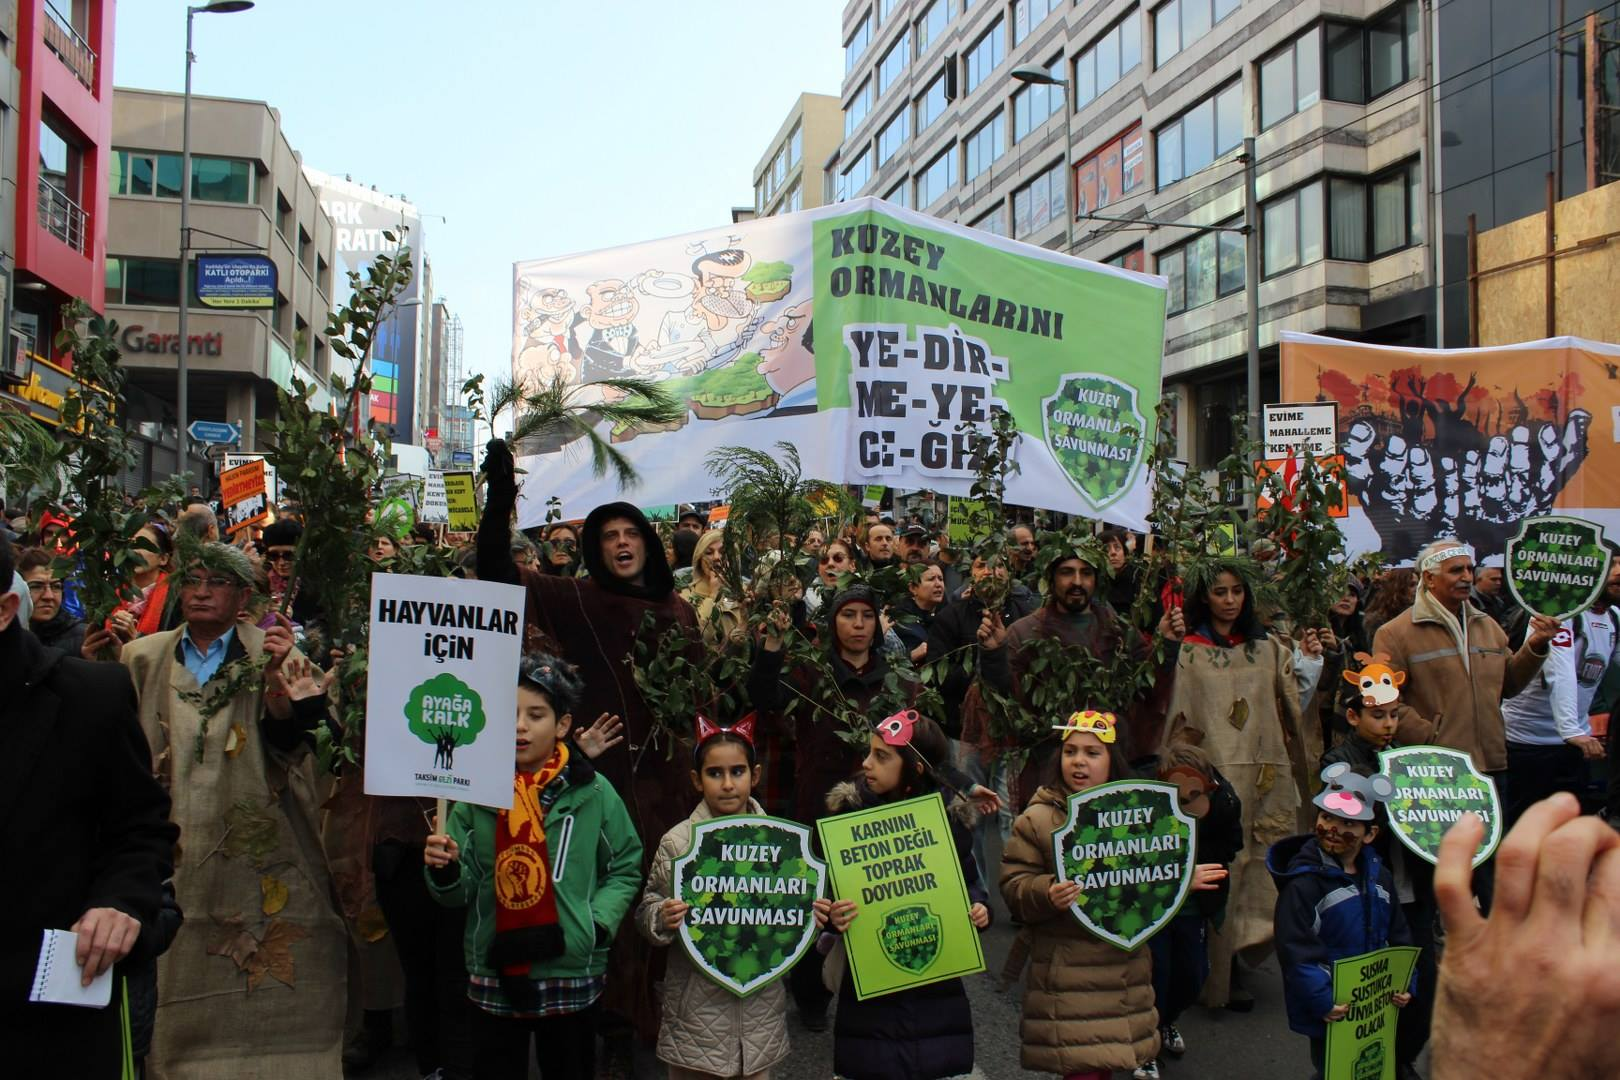 İstanbul'u savunmak, demokrasiyi savunmak